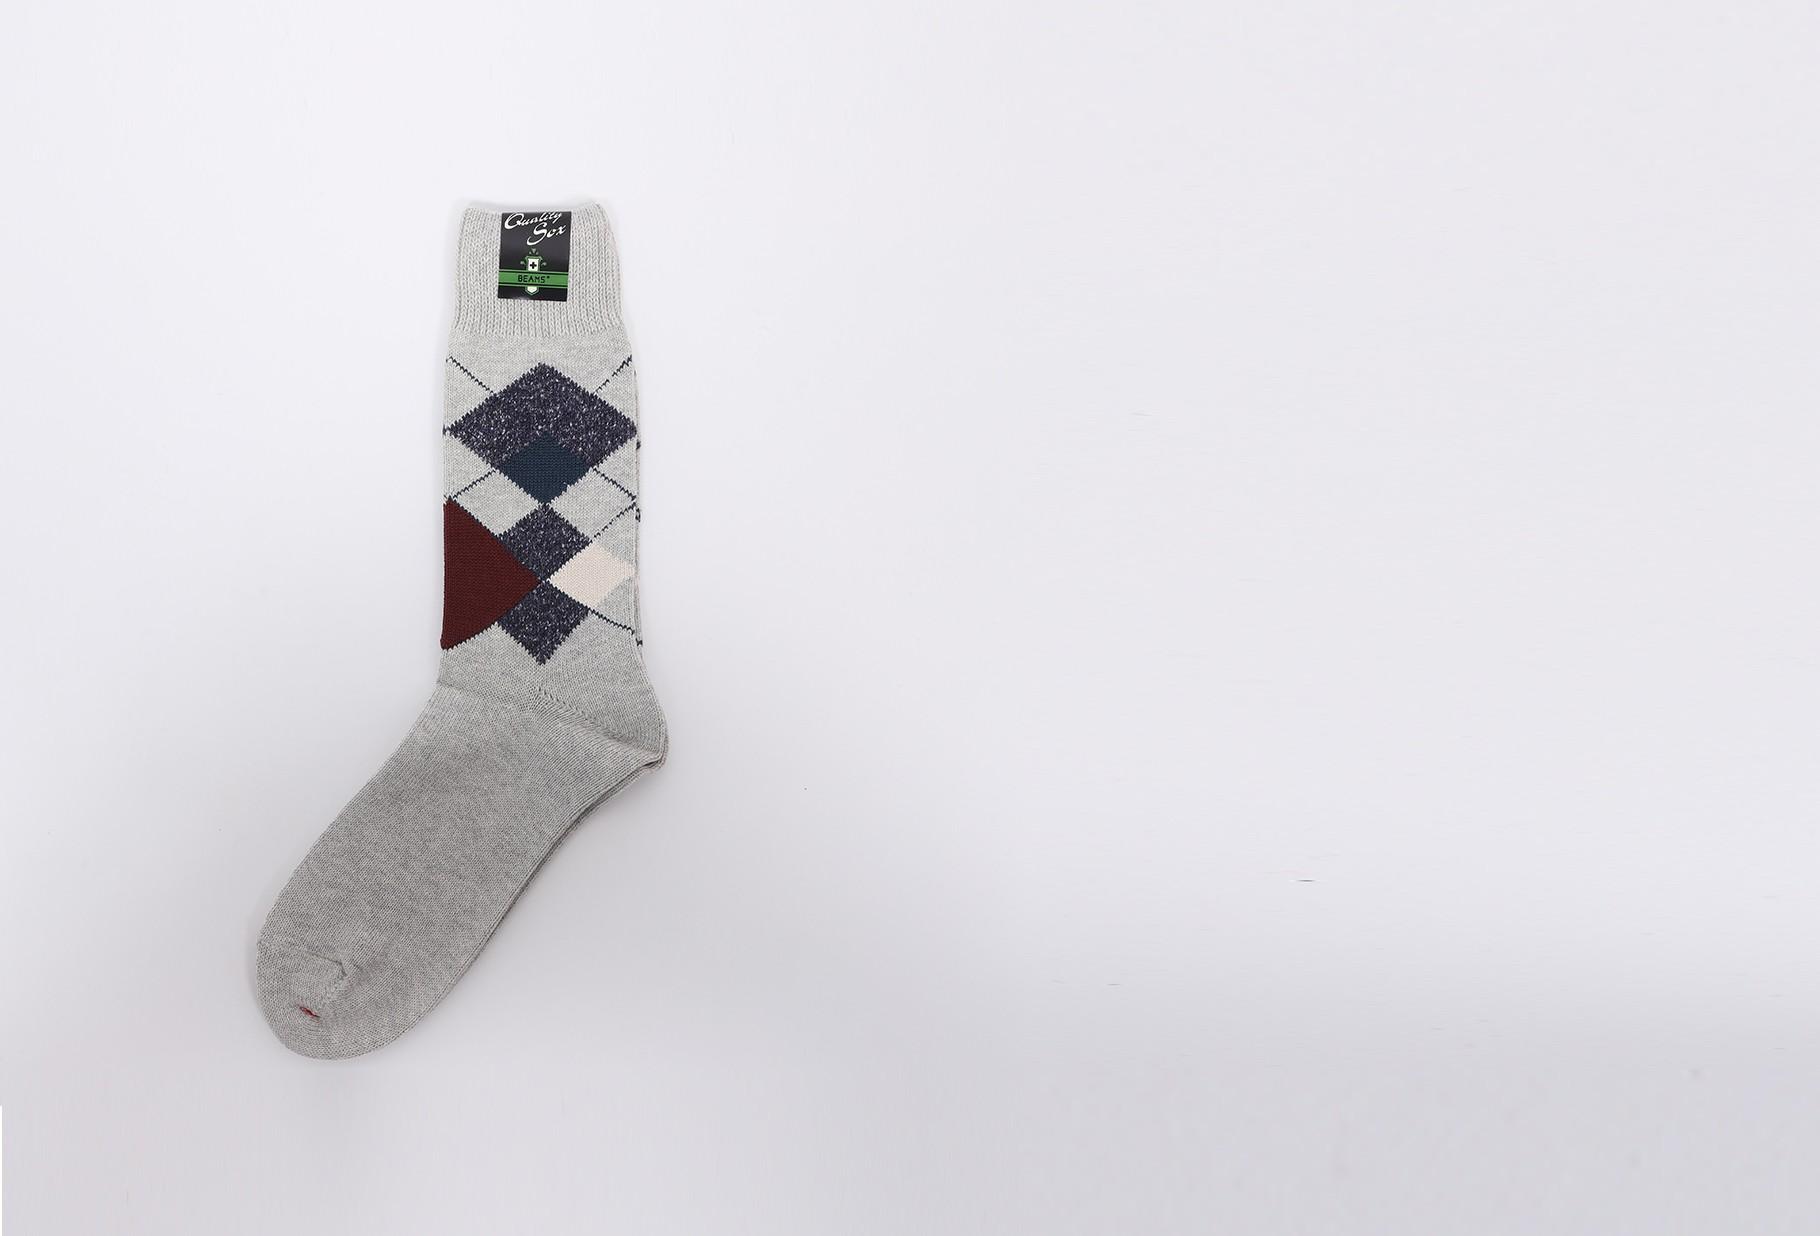 BEAMS PLUS / Argyle socks Light grey